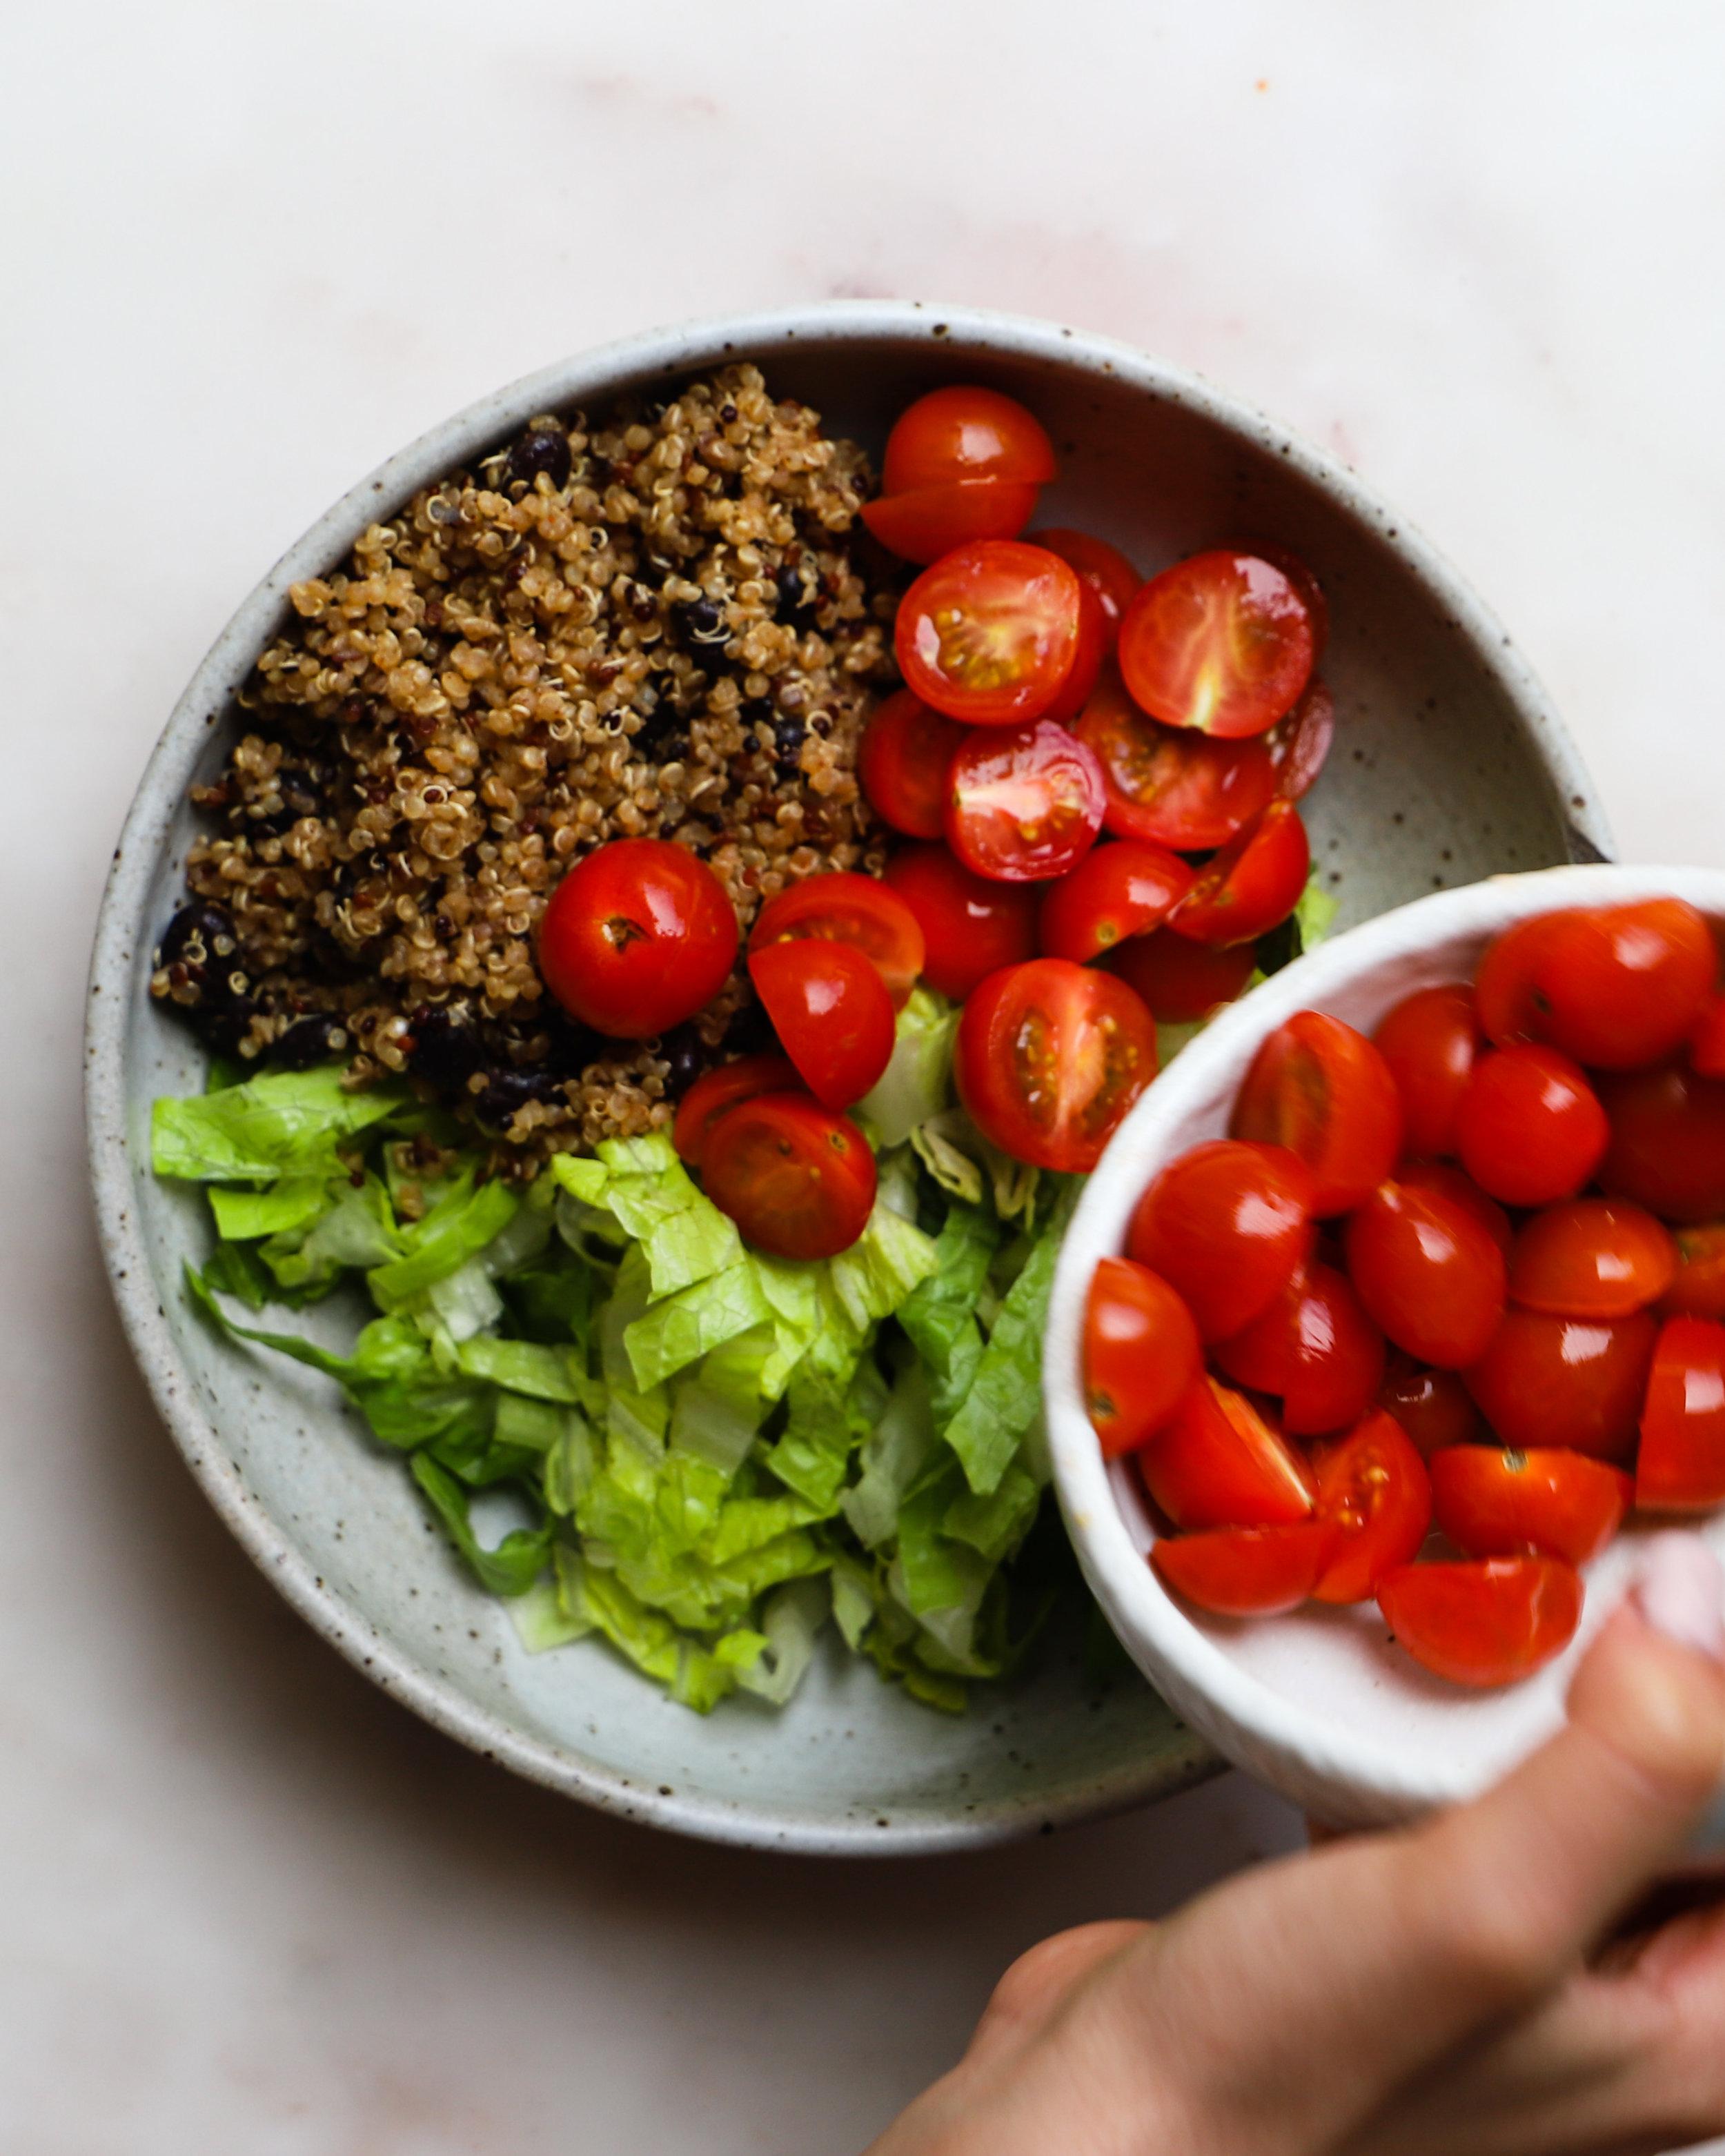 Lindseyeatsla_Taco_Salad_Chipotle_Dressing-8.jpg